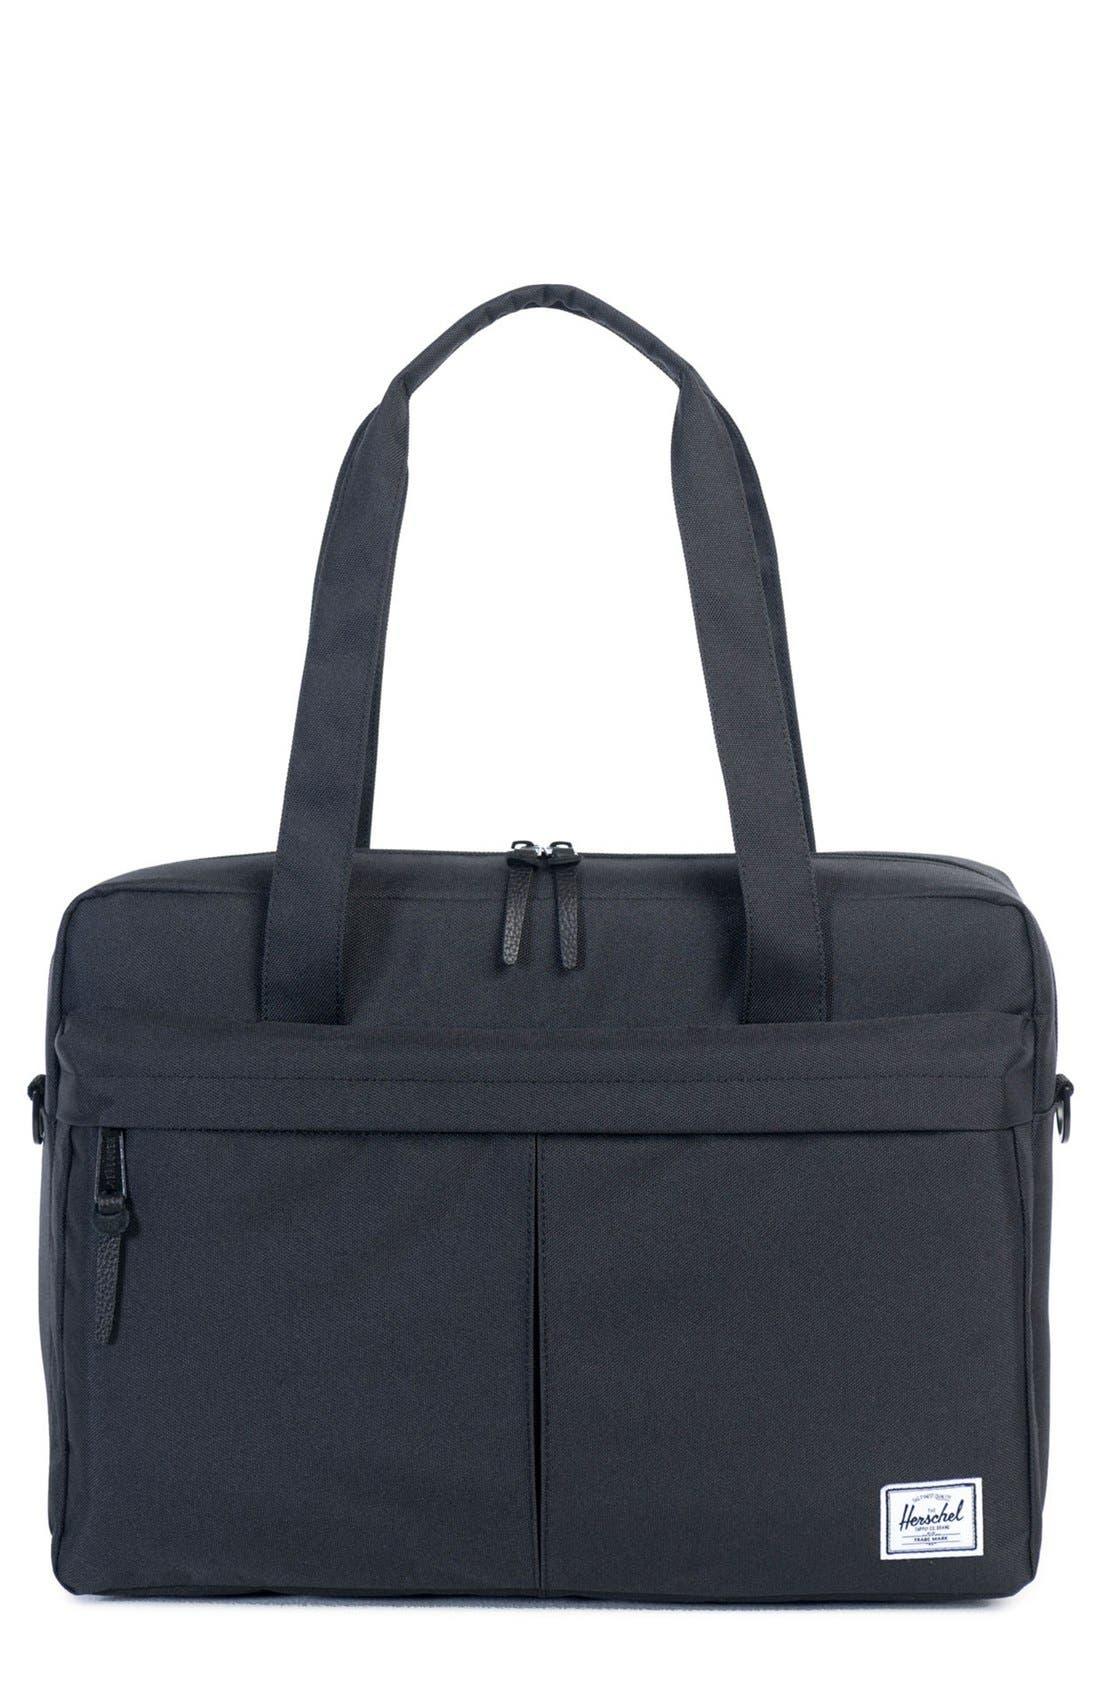 'Gibson' Messenger Bag,                         Main,                         color, Black